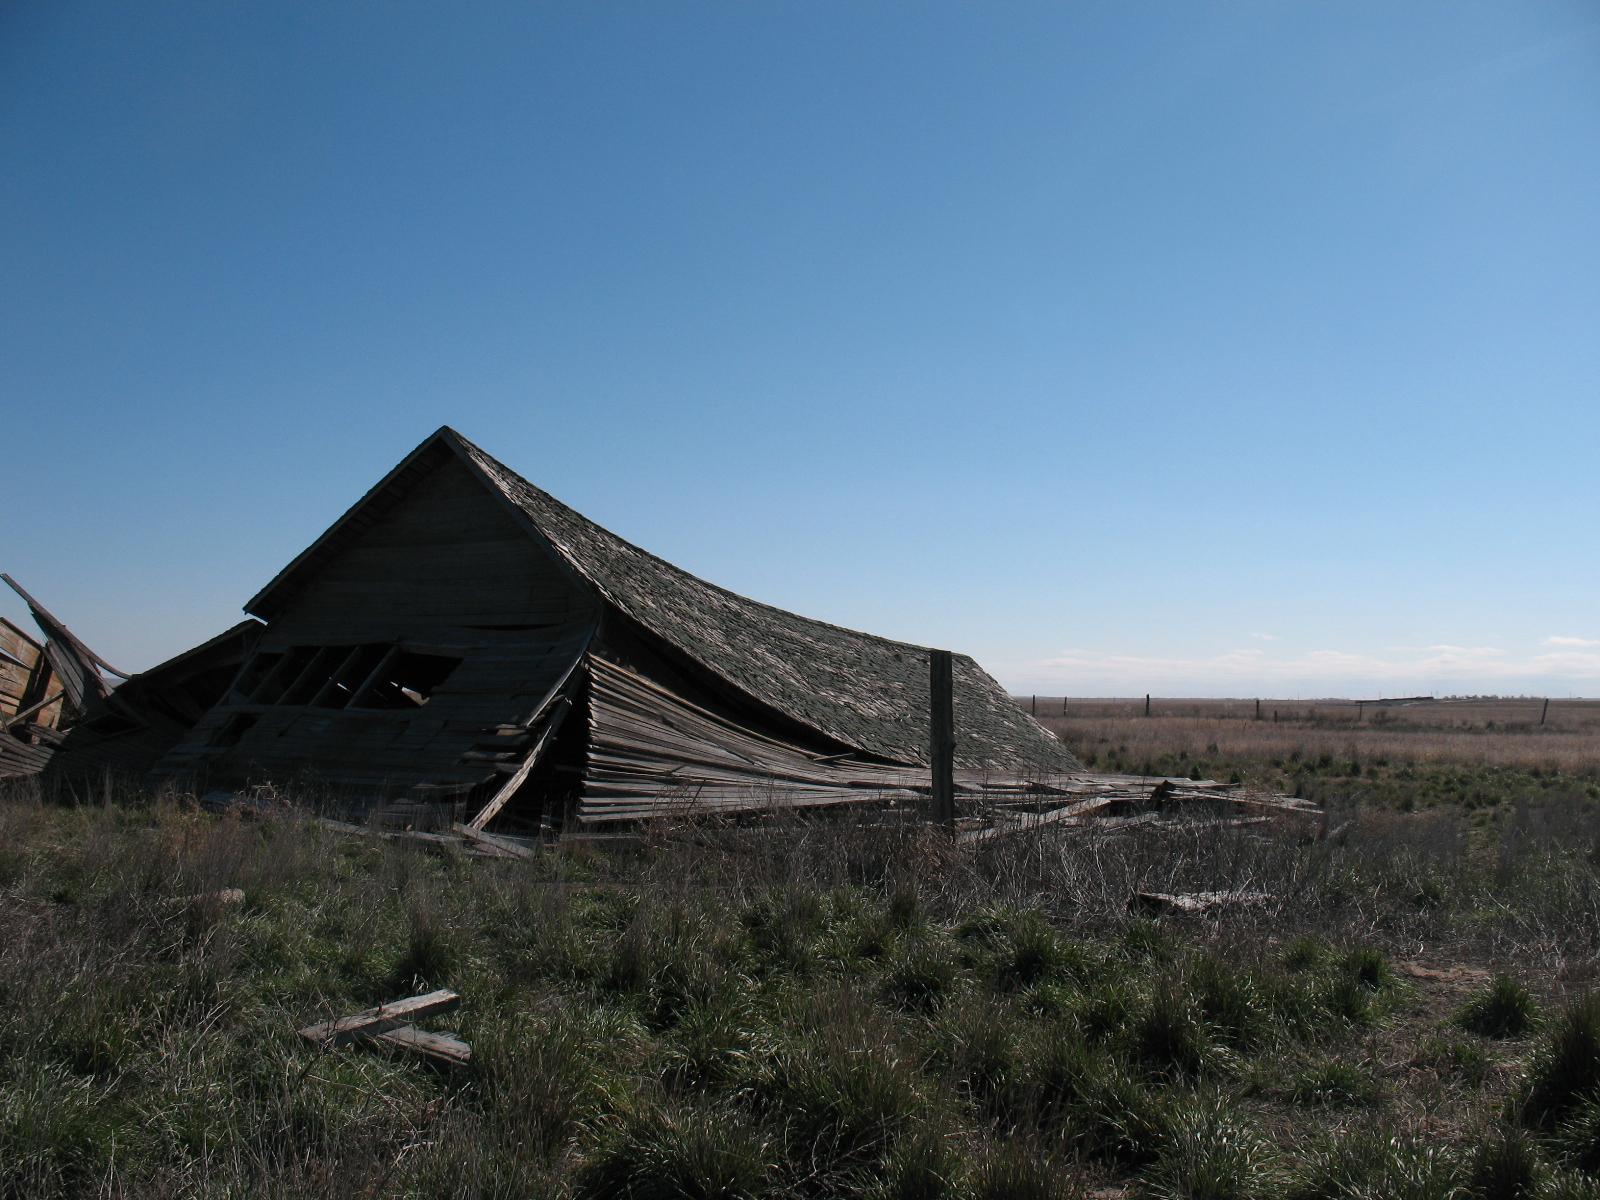 Photo by Author in Pawnee Grasslands, Colorado